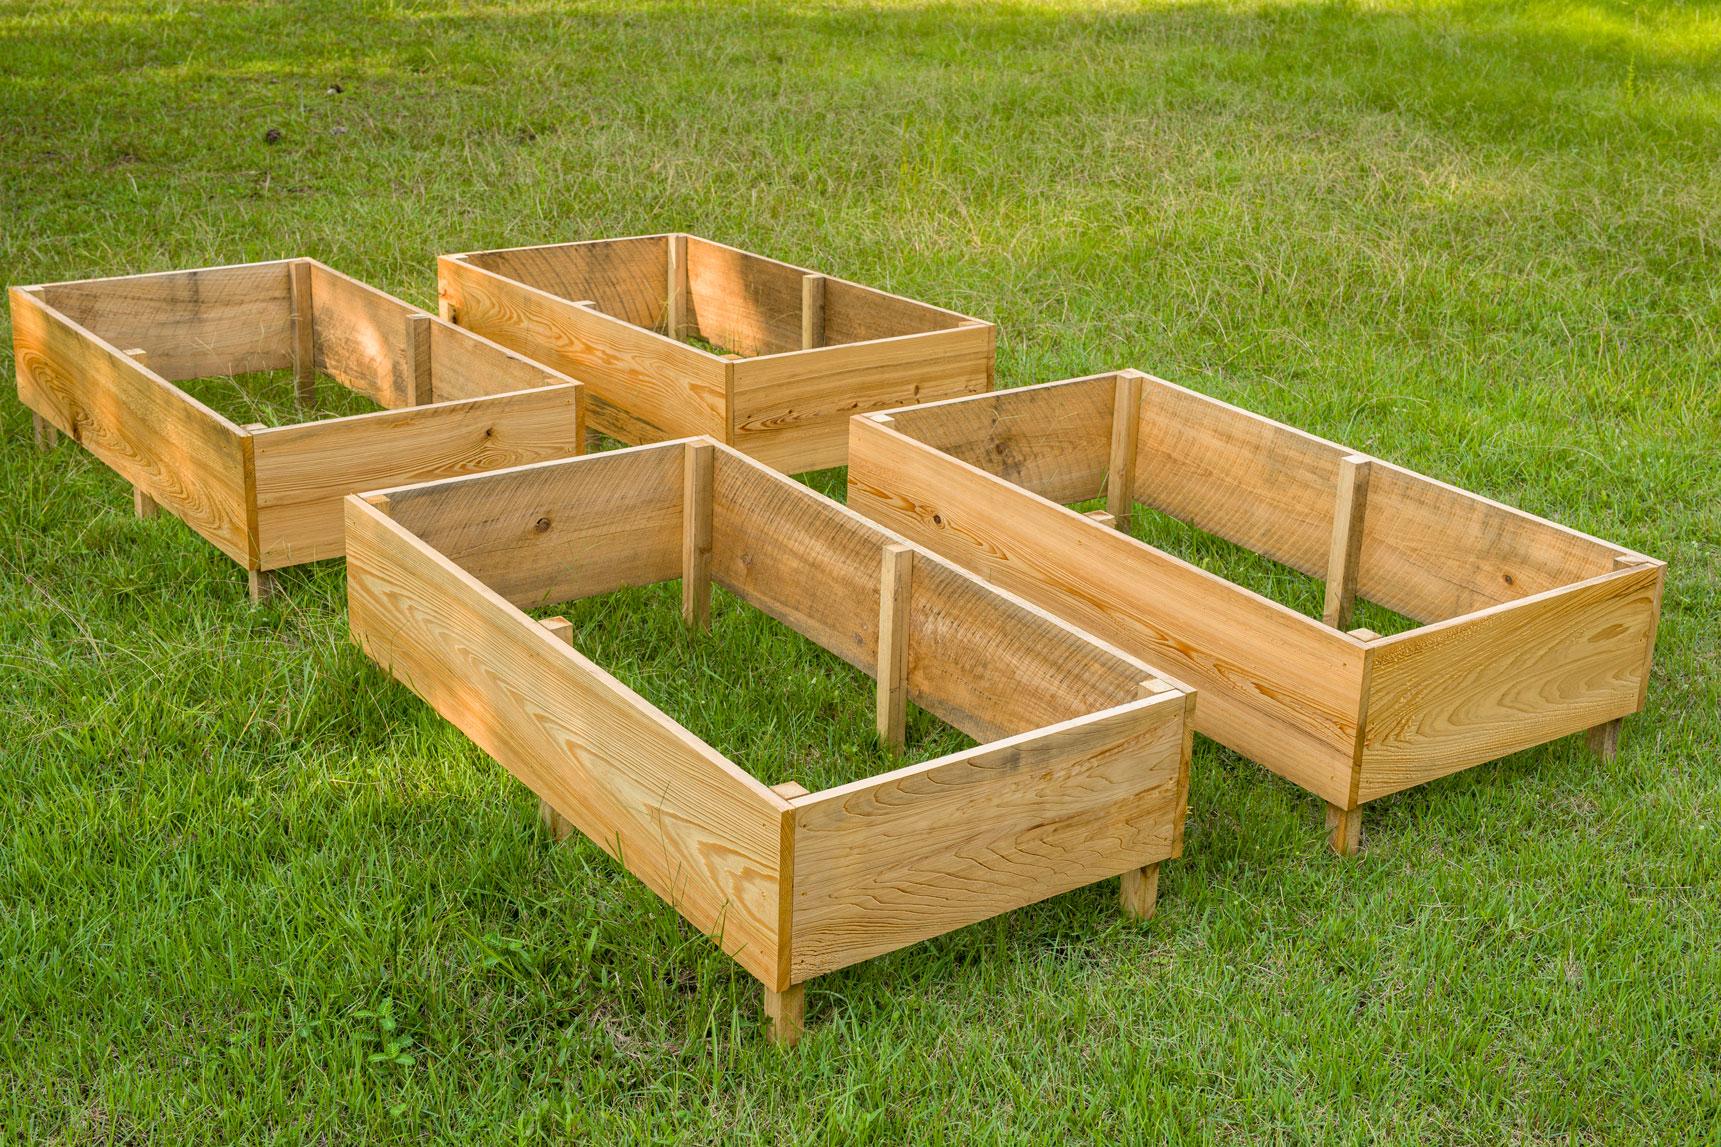 four DIY Raised Garden Beds sitting in the grass